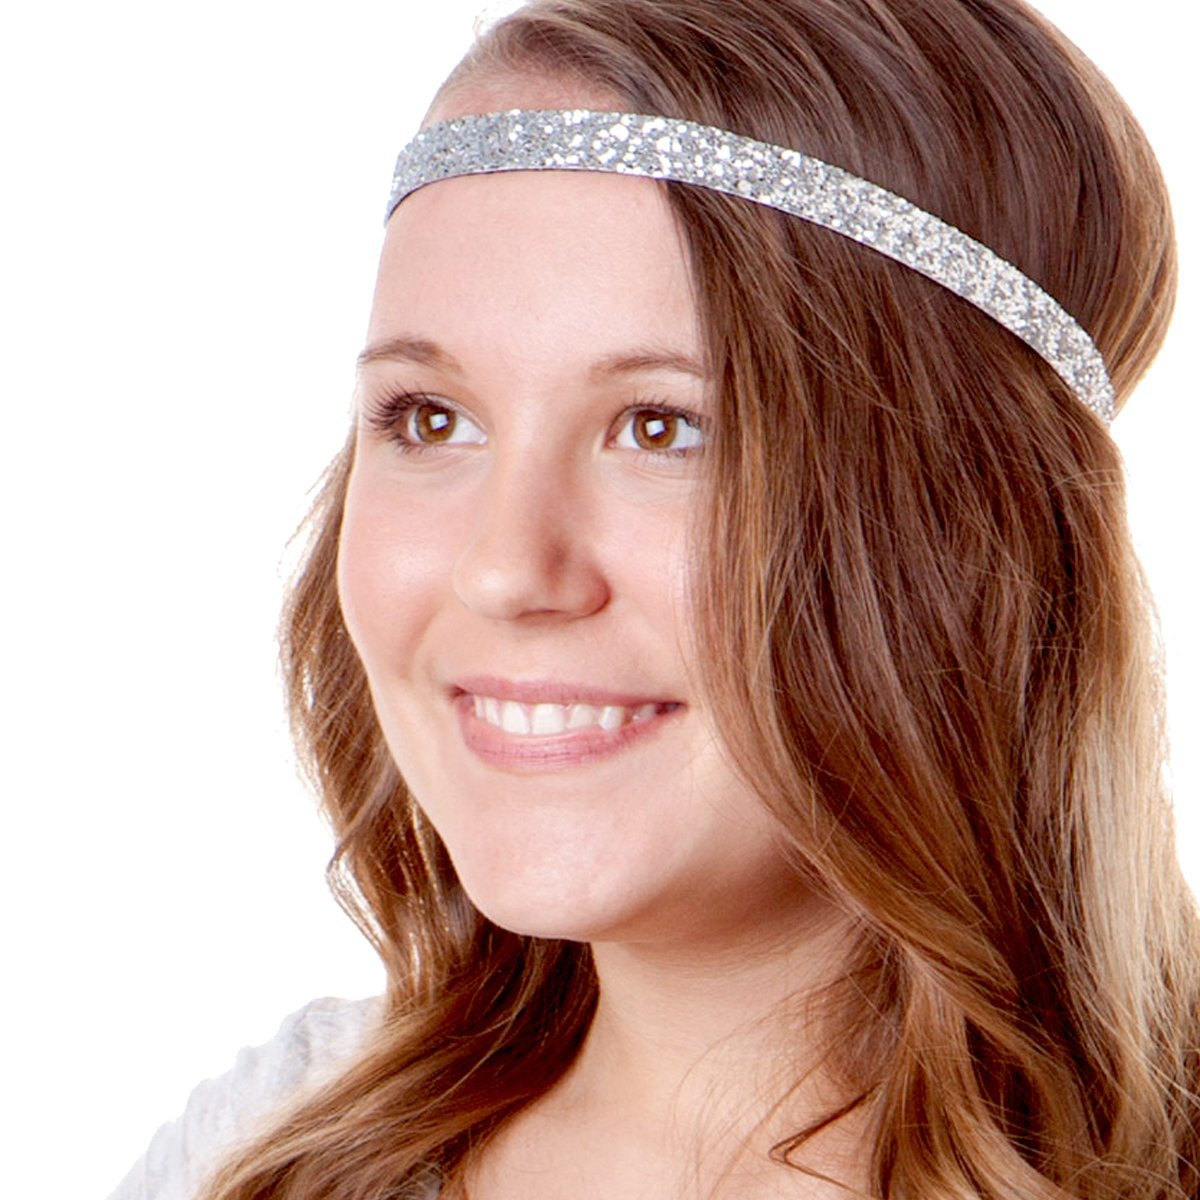 Hipsy Women's Adjustable NO SLIP Skinny Bling Glitter Headband Multi 3pk (Black/Gold/Silver)